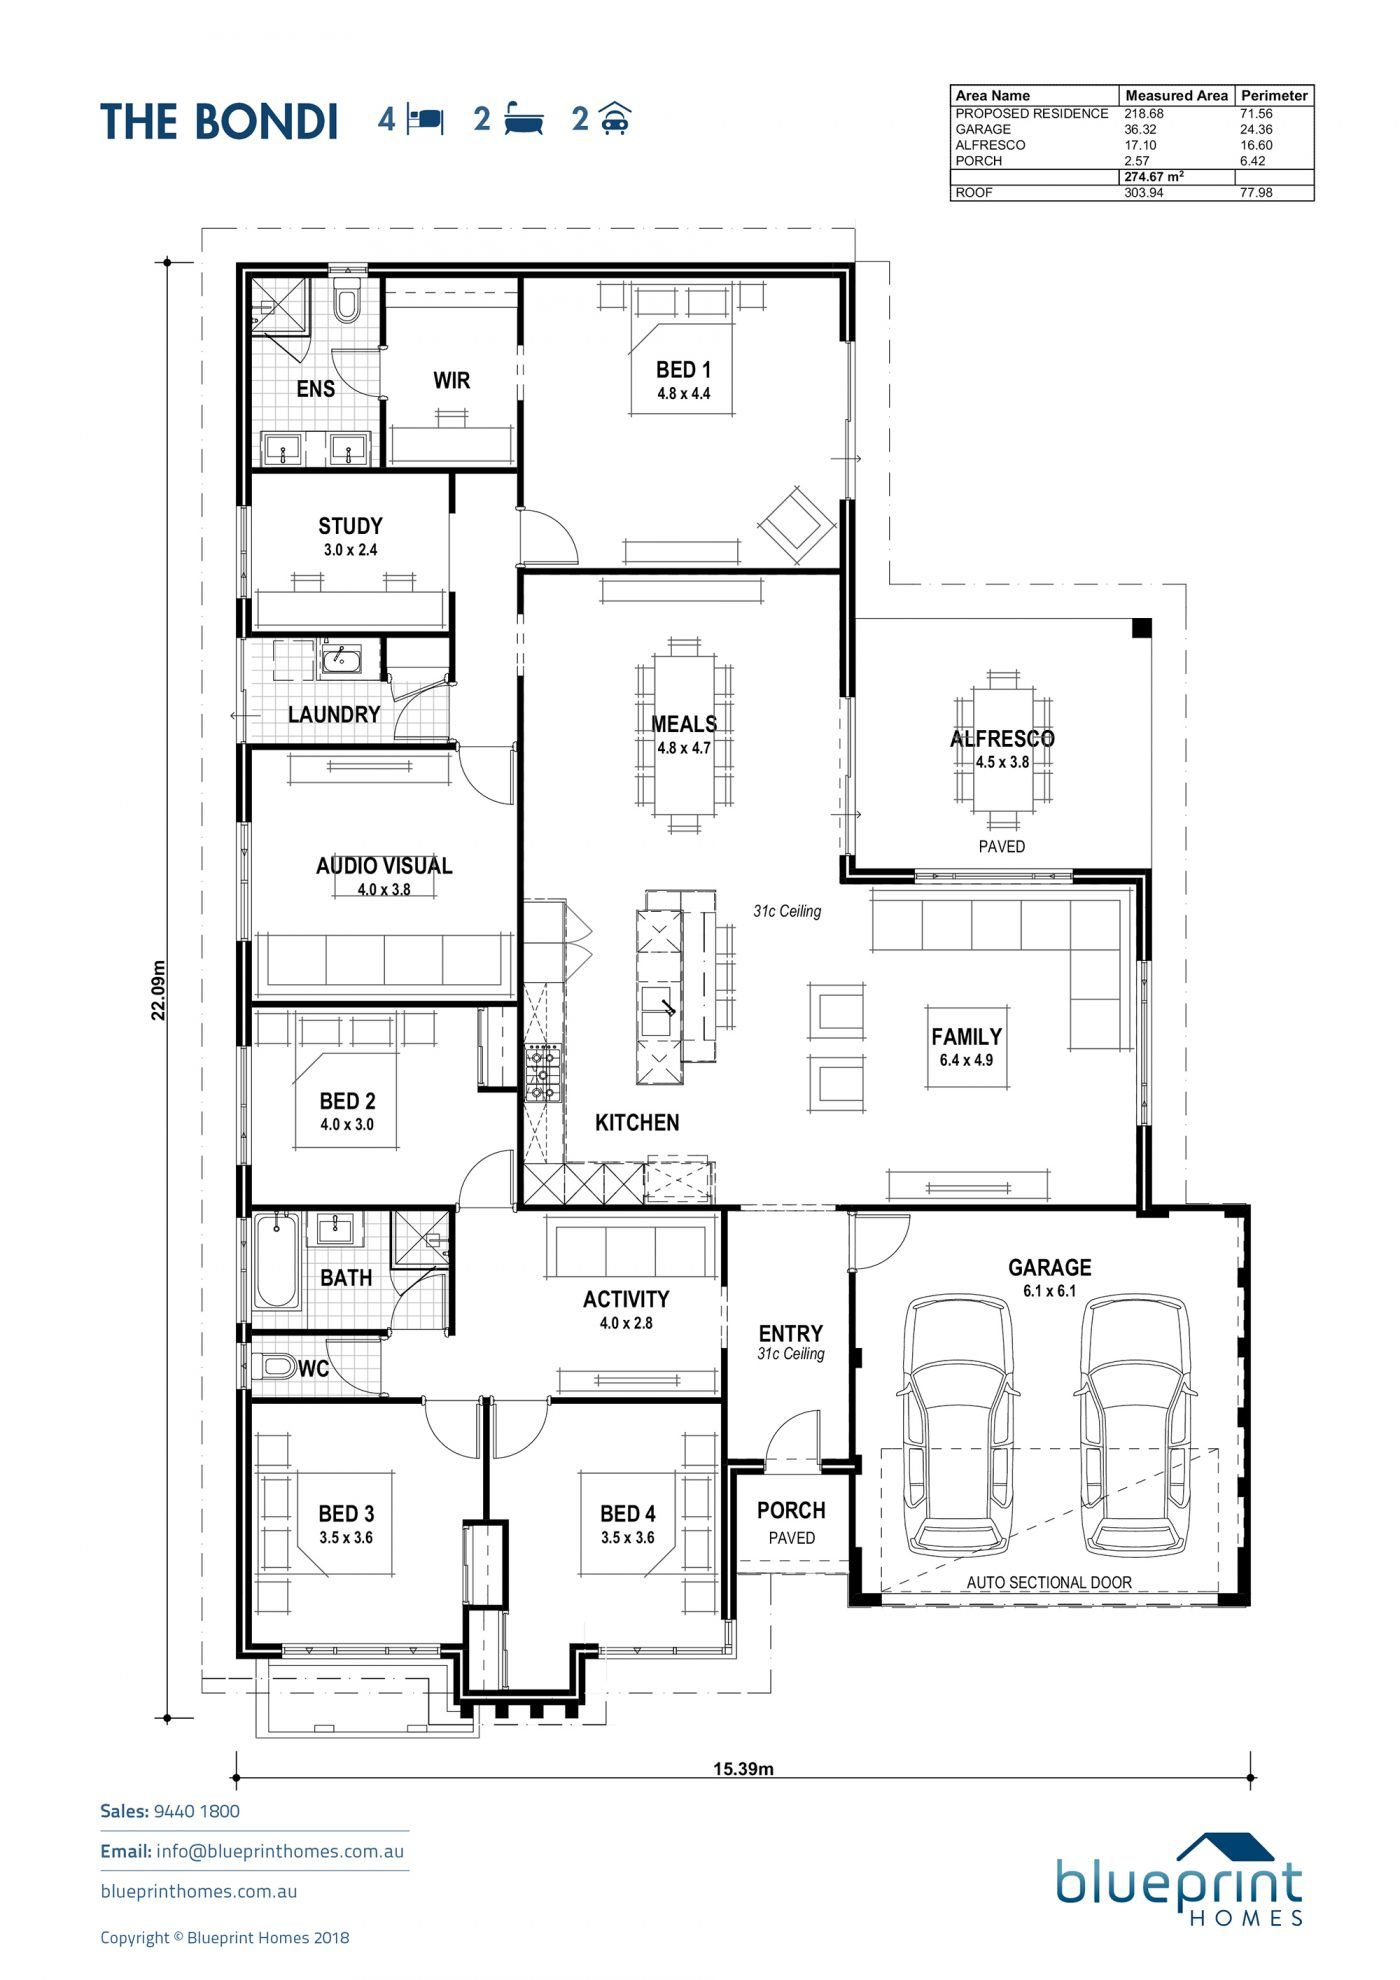 Craftsman House Plans In 2020 Craftsman House Plans Craftsman House Cottage House Plans